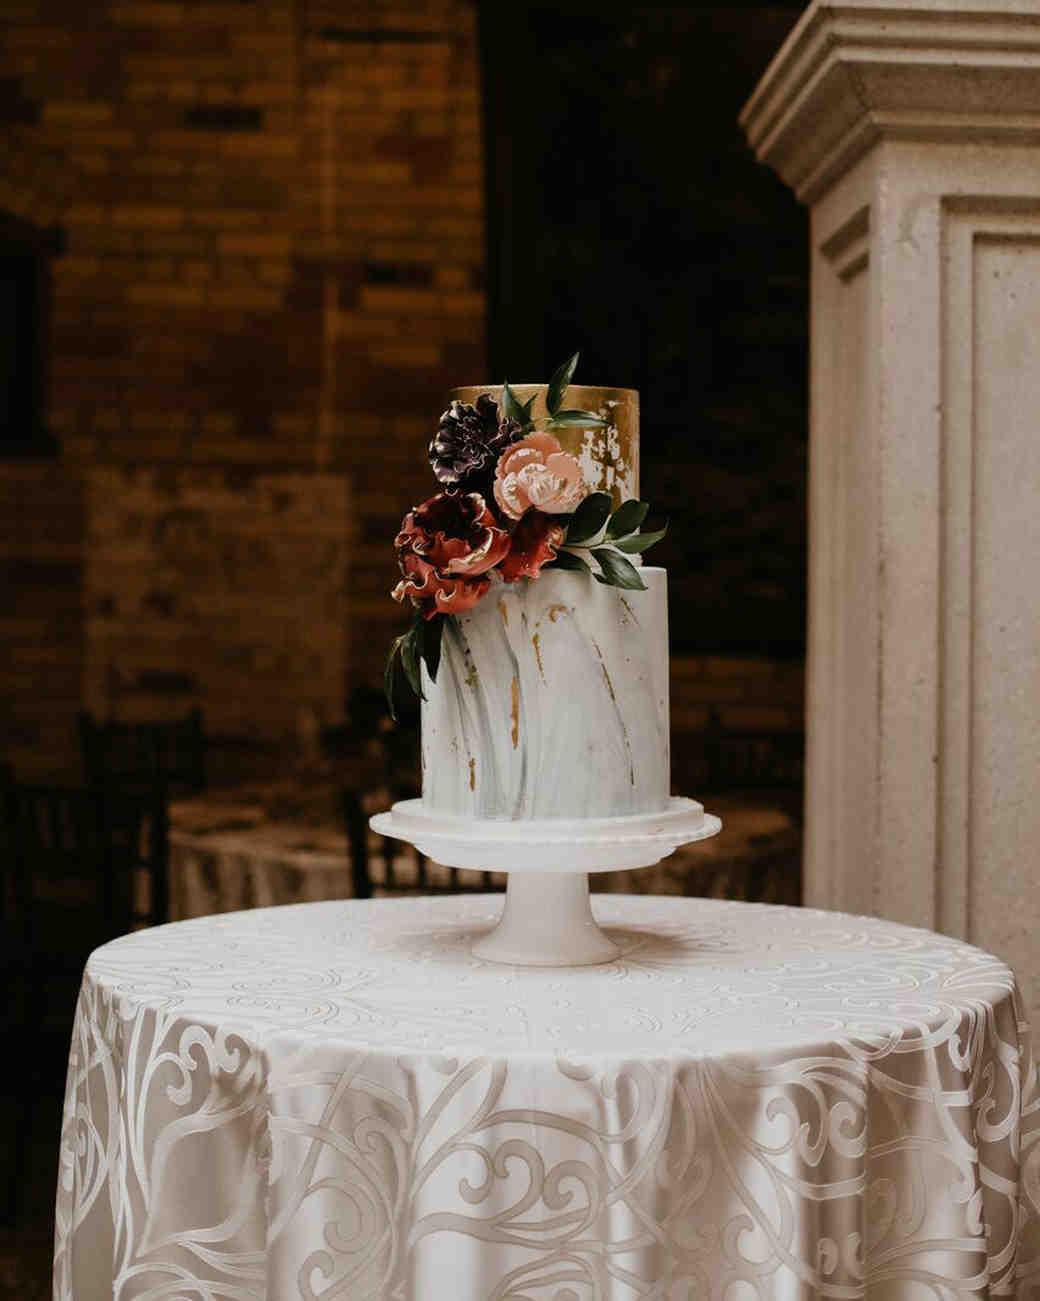 sugar flower wedding cakes scarlet oneill